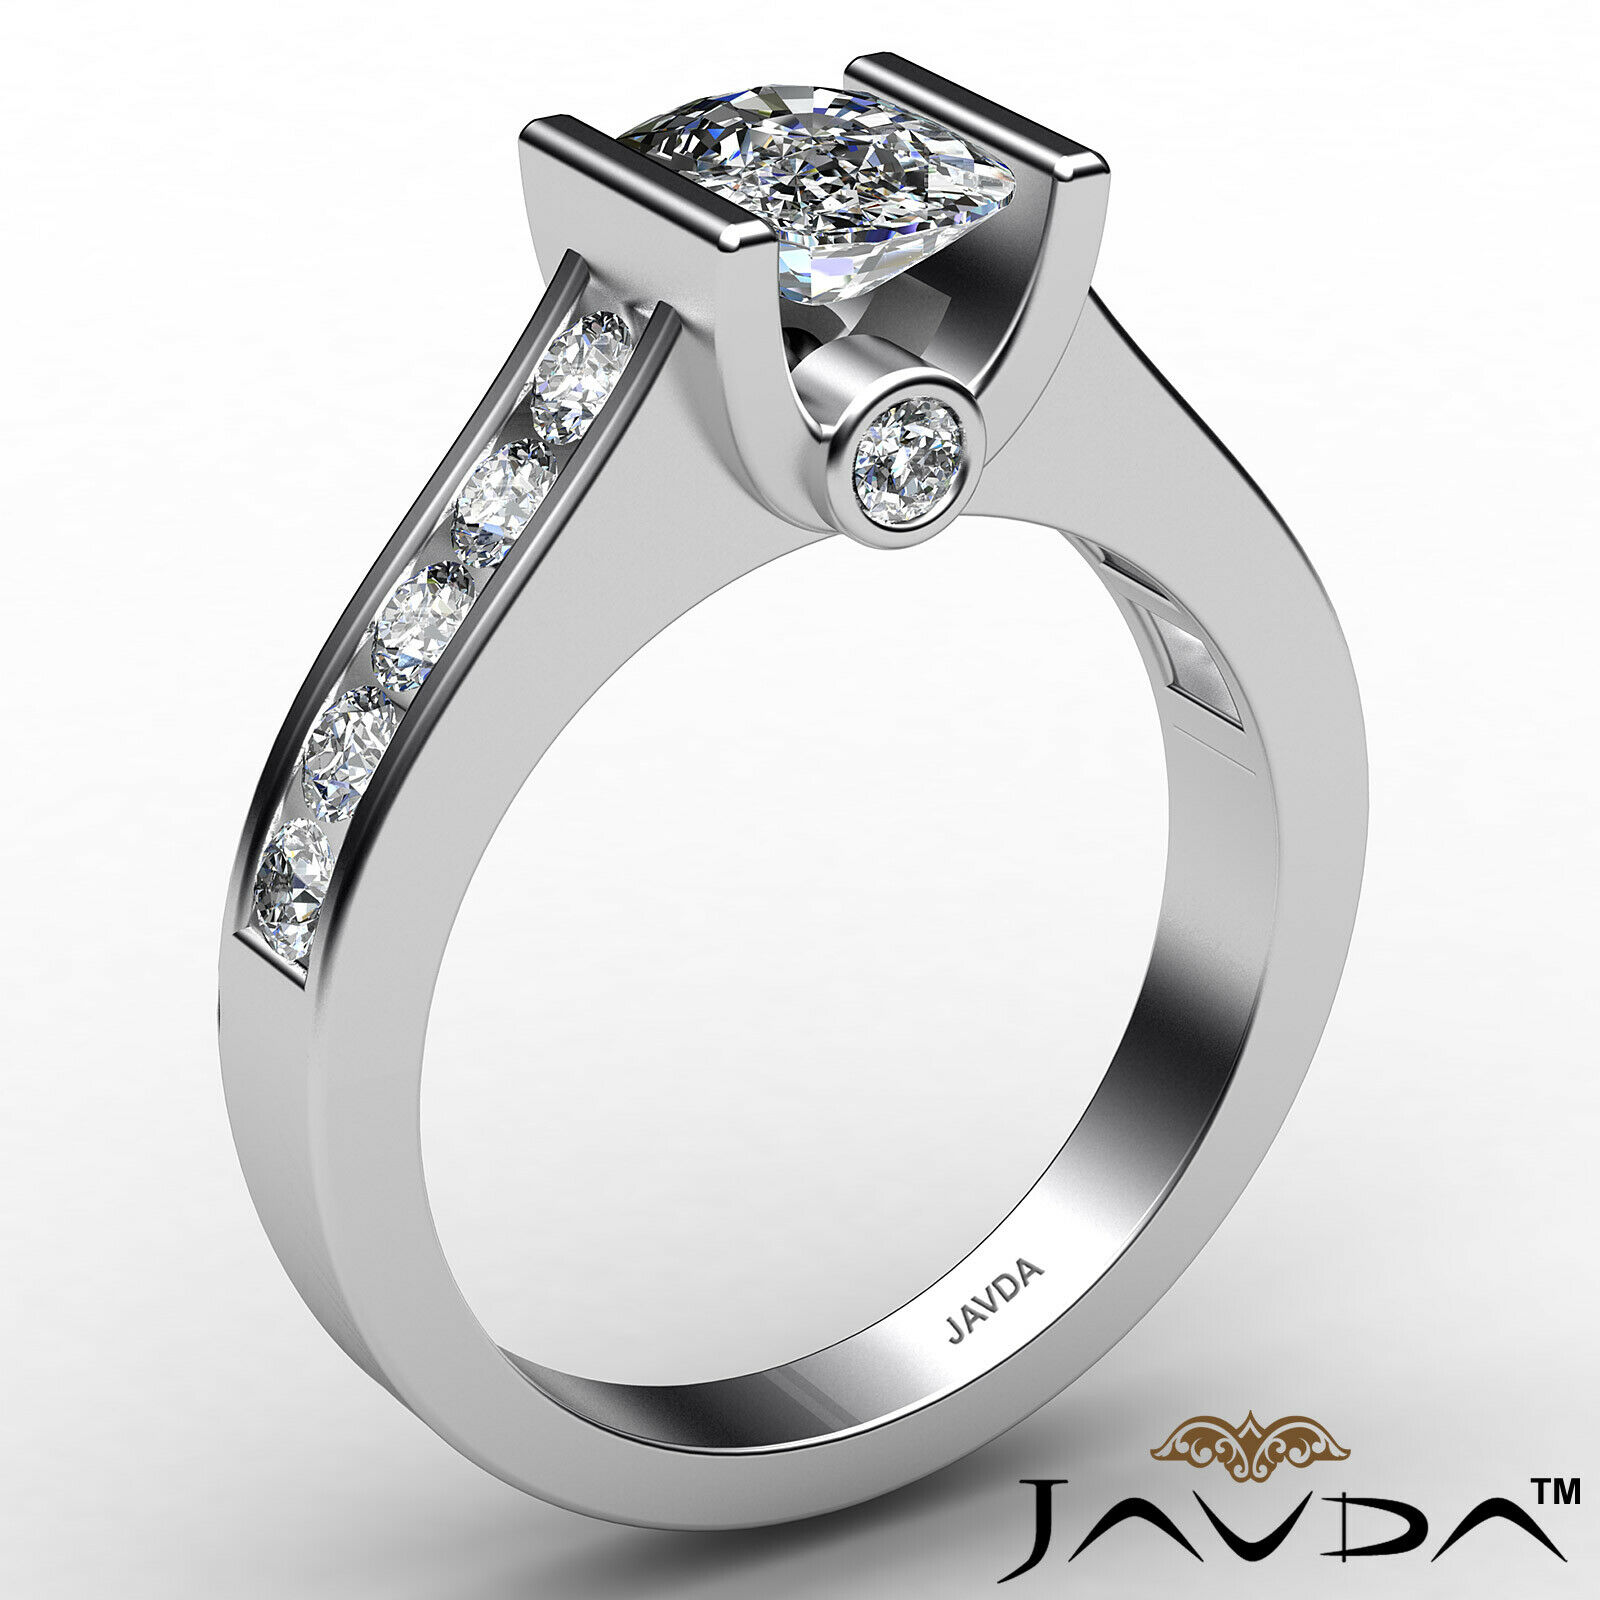 Bezel Cushion Diamond Engagement Women's Ring GIA, J Color SI1 clarity 1.53 ctw. 3